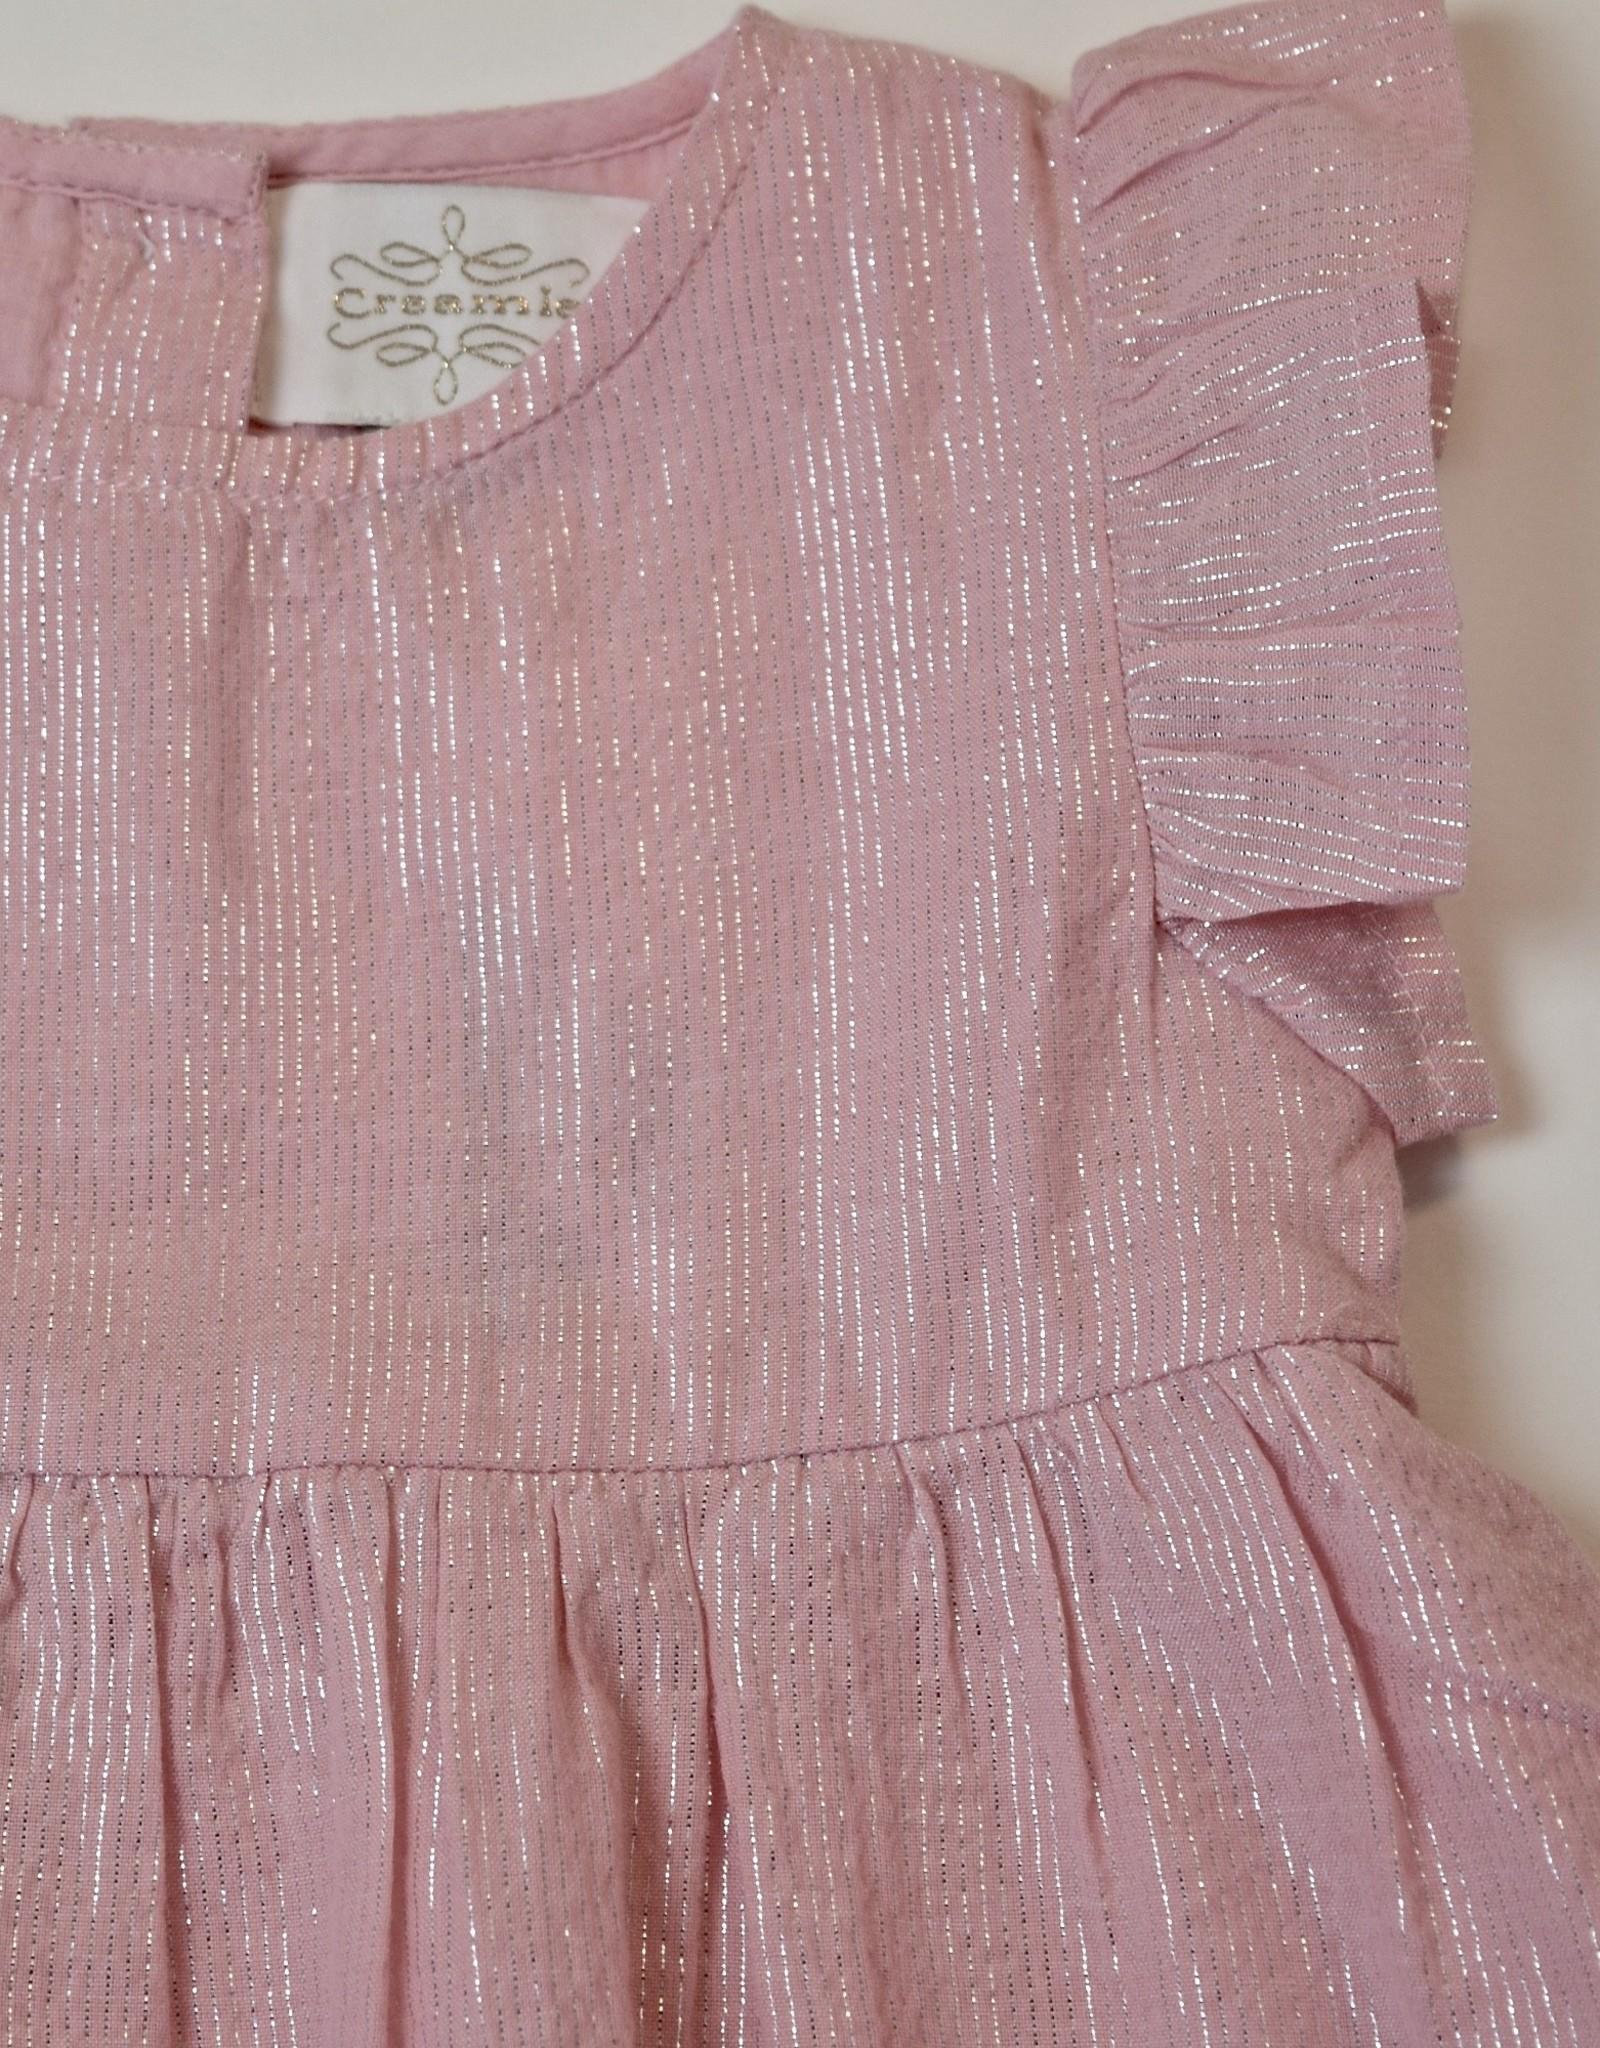 Creamie Pink Metallic Dress